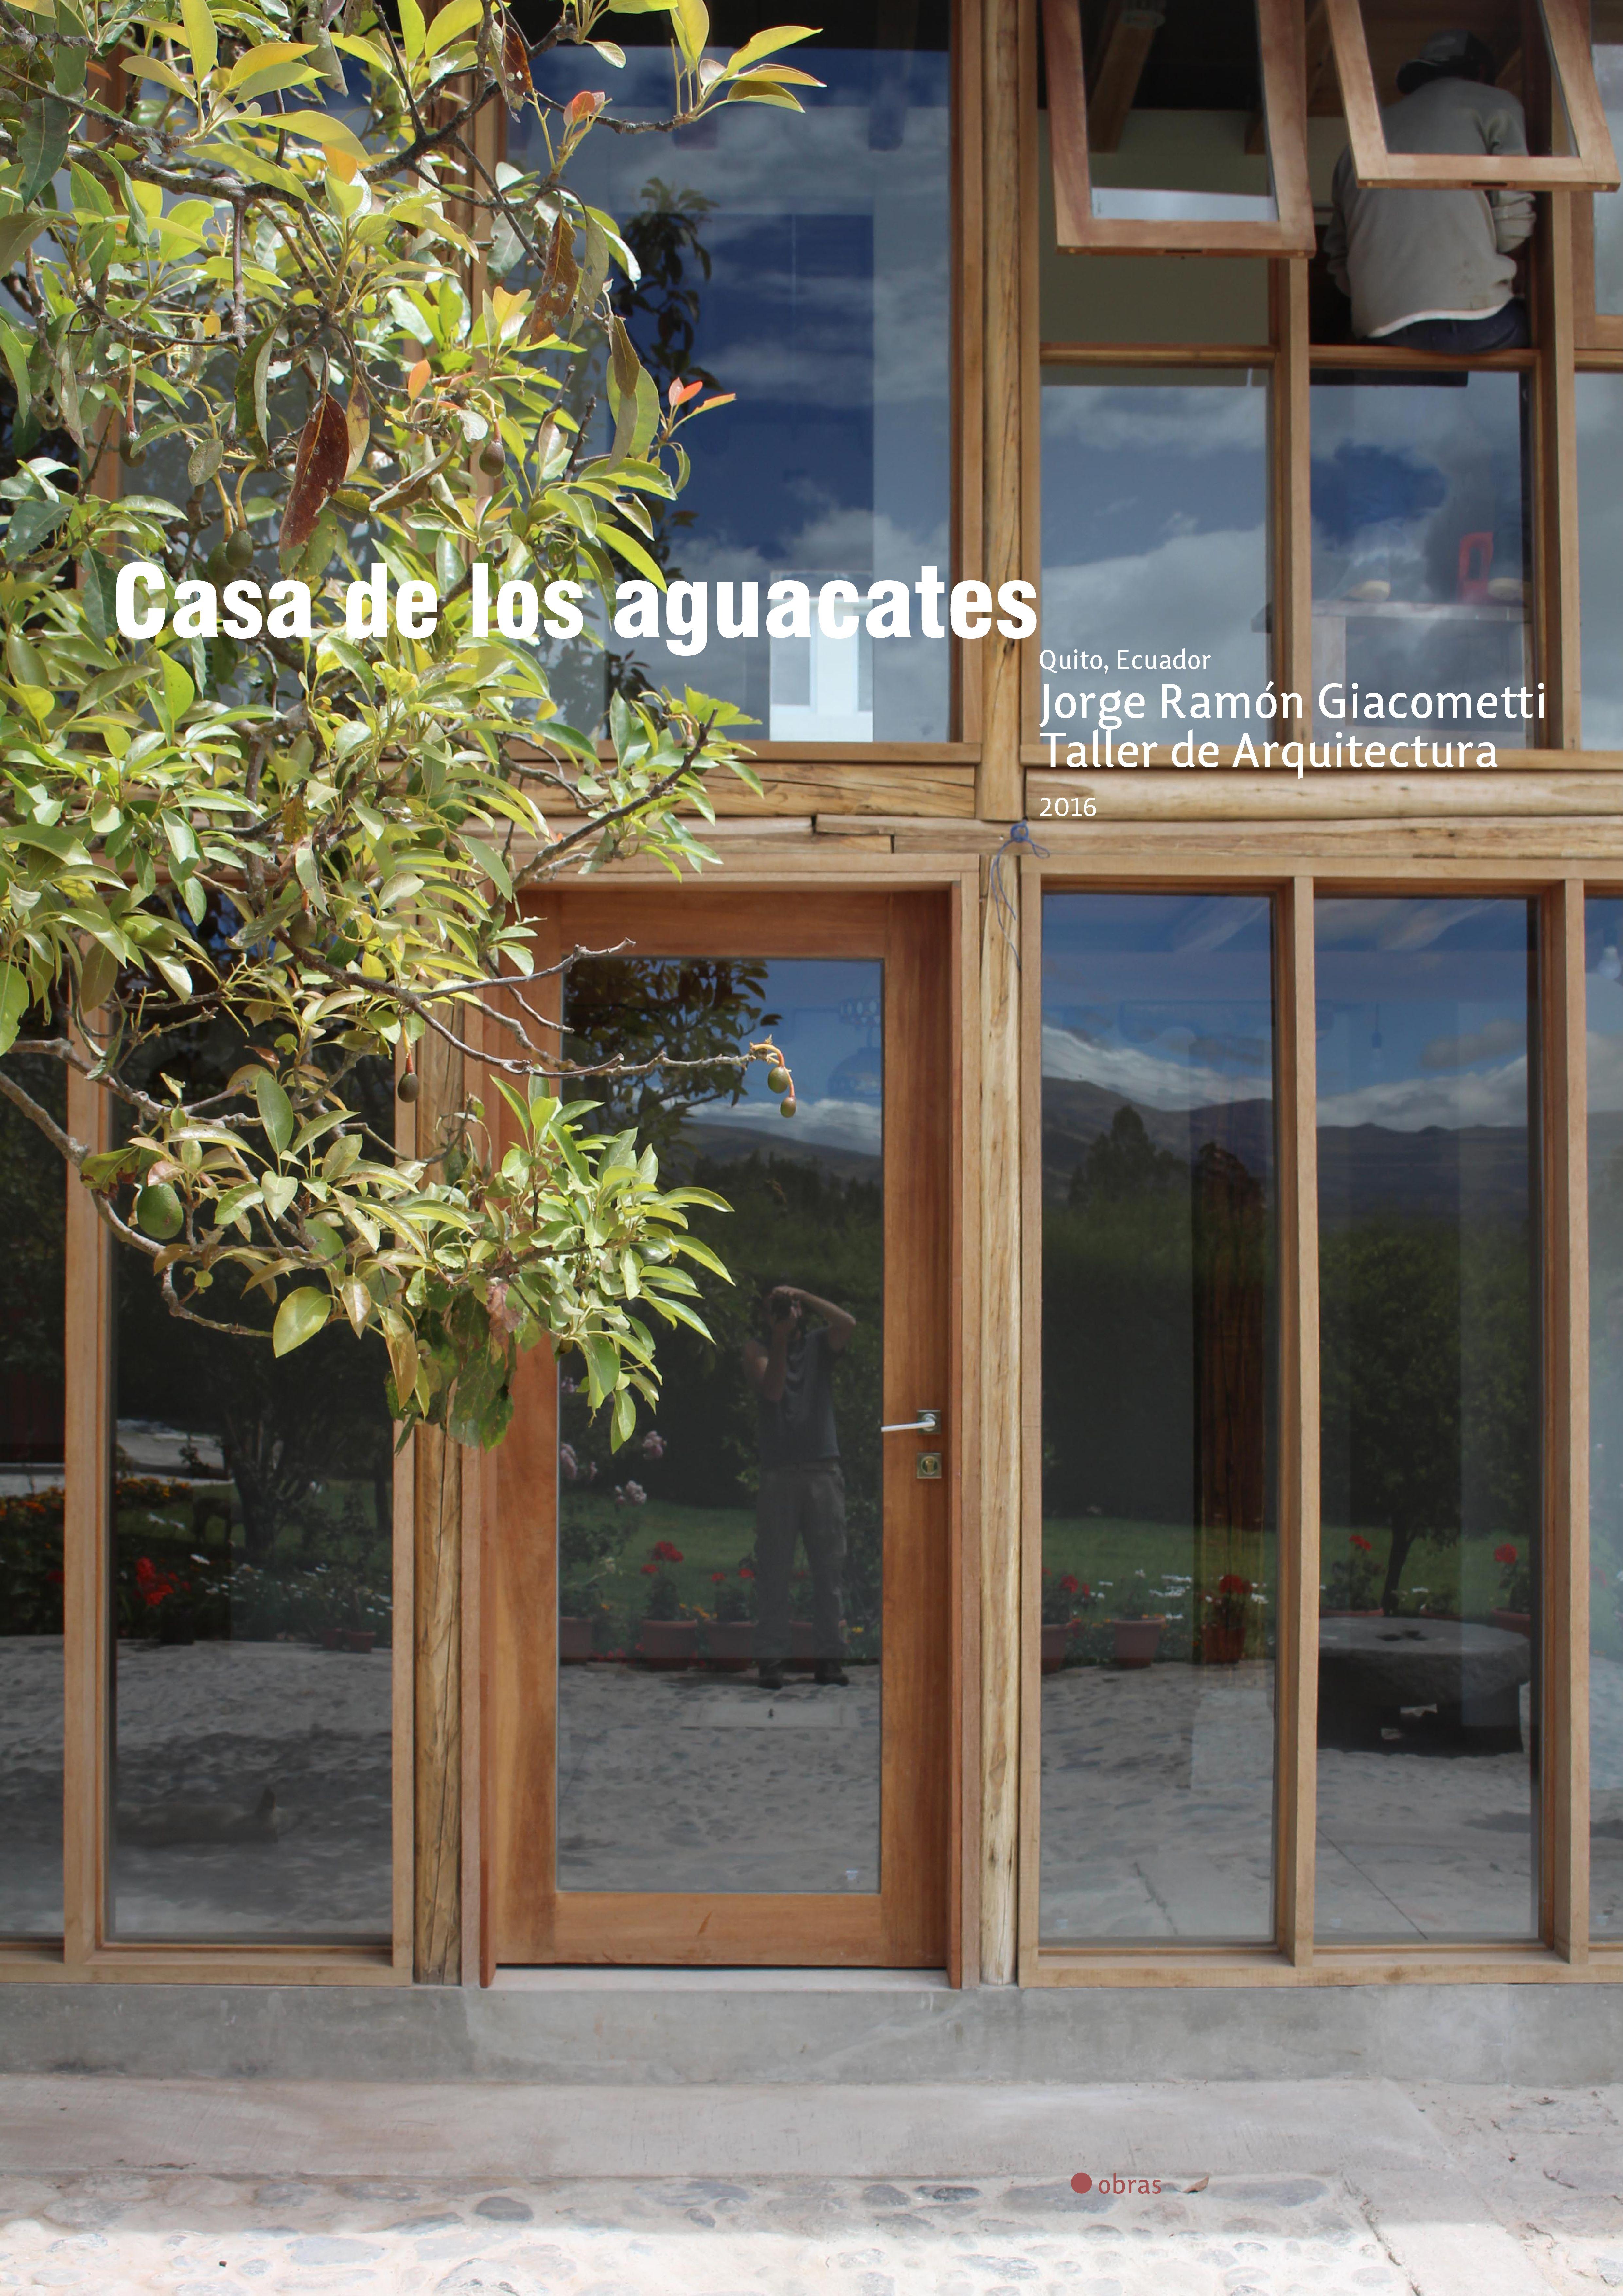 Casa De Los Aguacates Jorge Ramon Giacometti Taller De Arquitectura Tectonicablog Fotografias Jeroni Taller De Arquitectura Arquitectura Ventanas De Vidrio